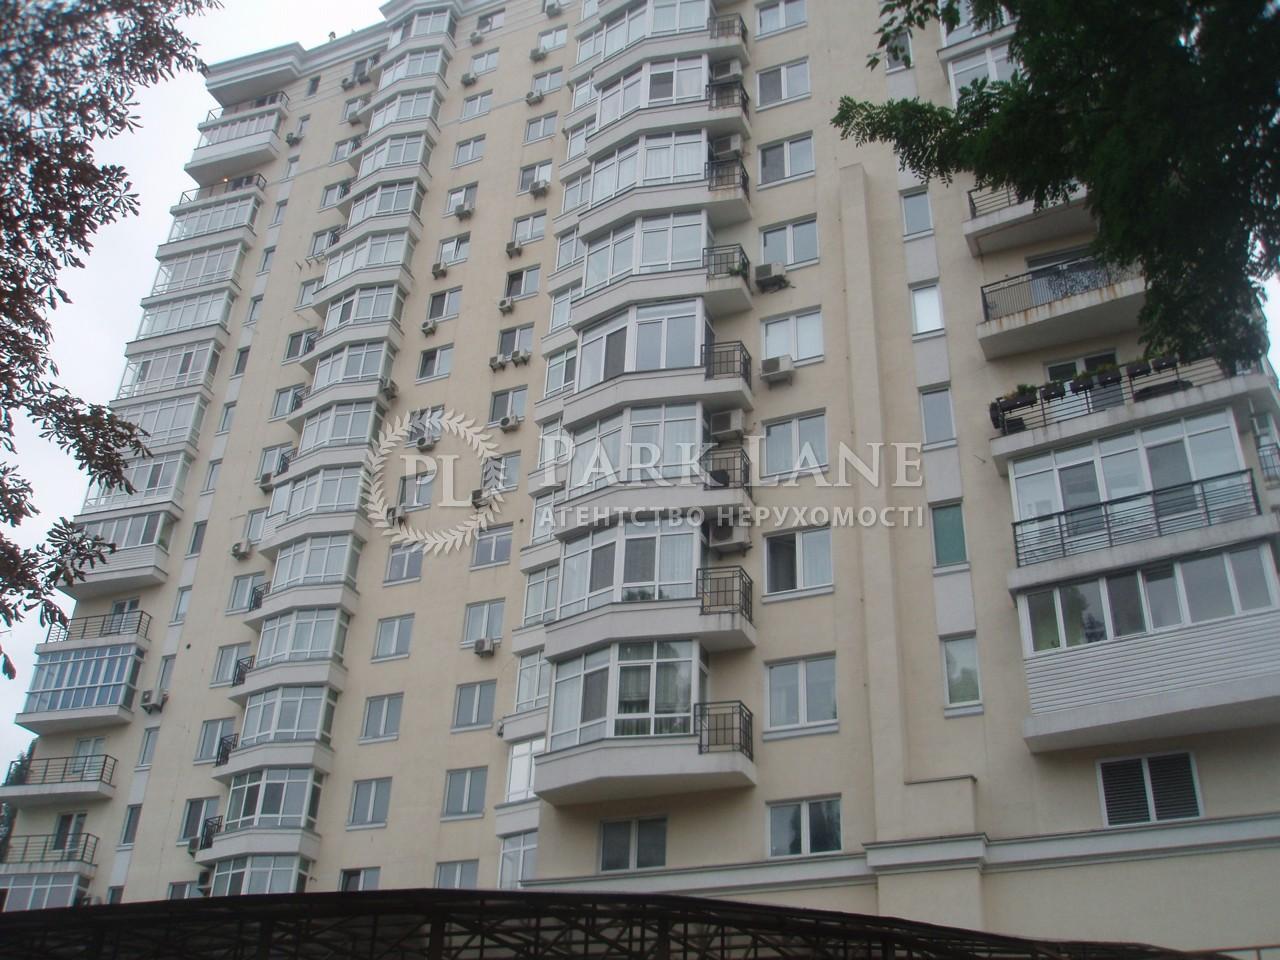 Квартира ул. Сечевых Стрельцов (Артема), 52а, Киев, J-24728 - Фото 13